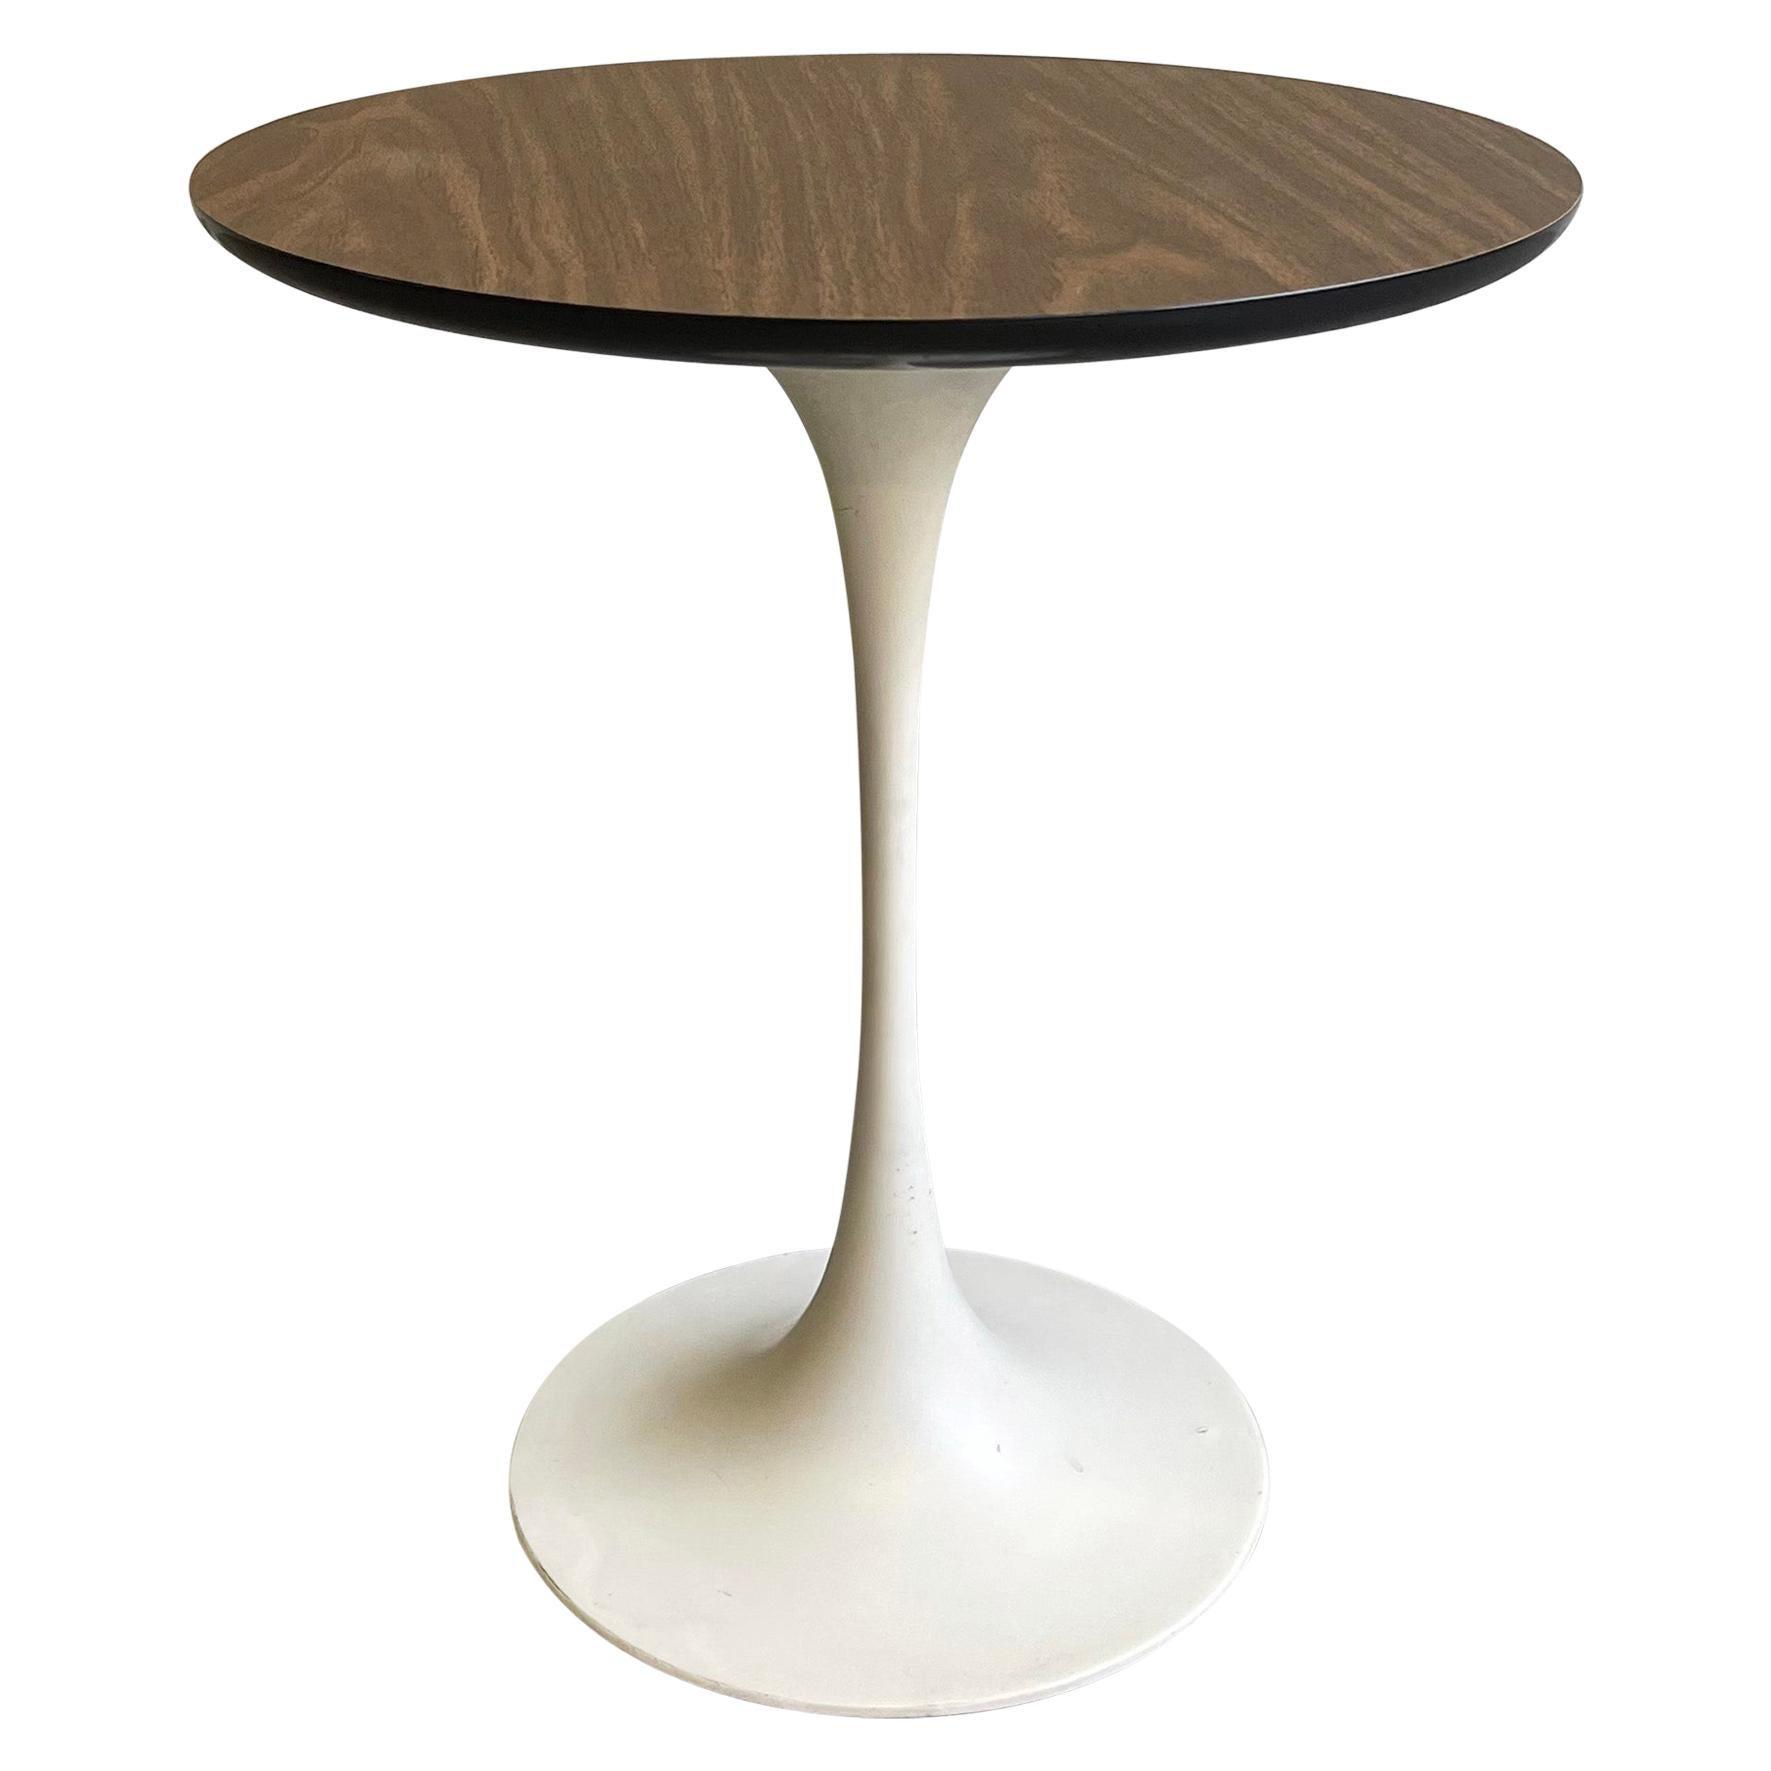 Mid-Century Modern Tulip Side Table by Eero Saarinen For Knoll